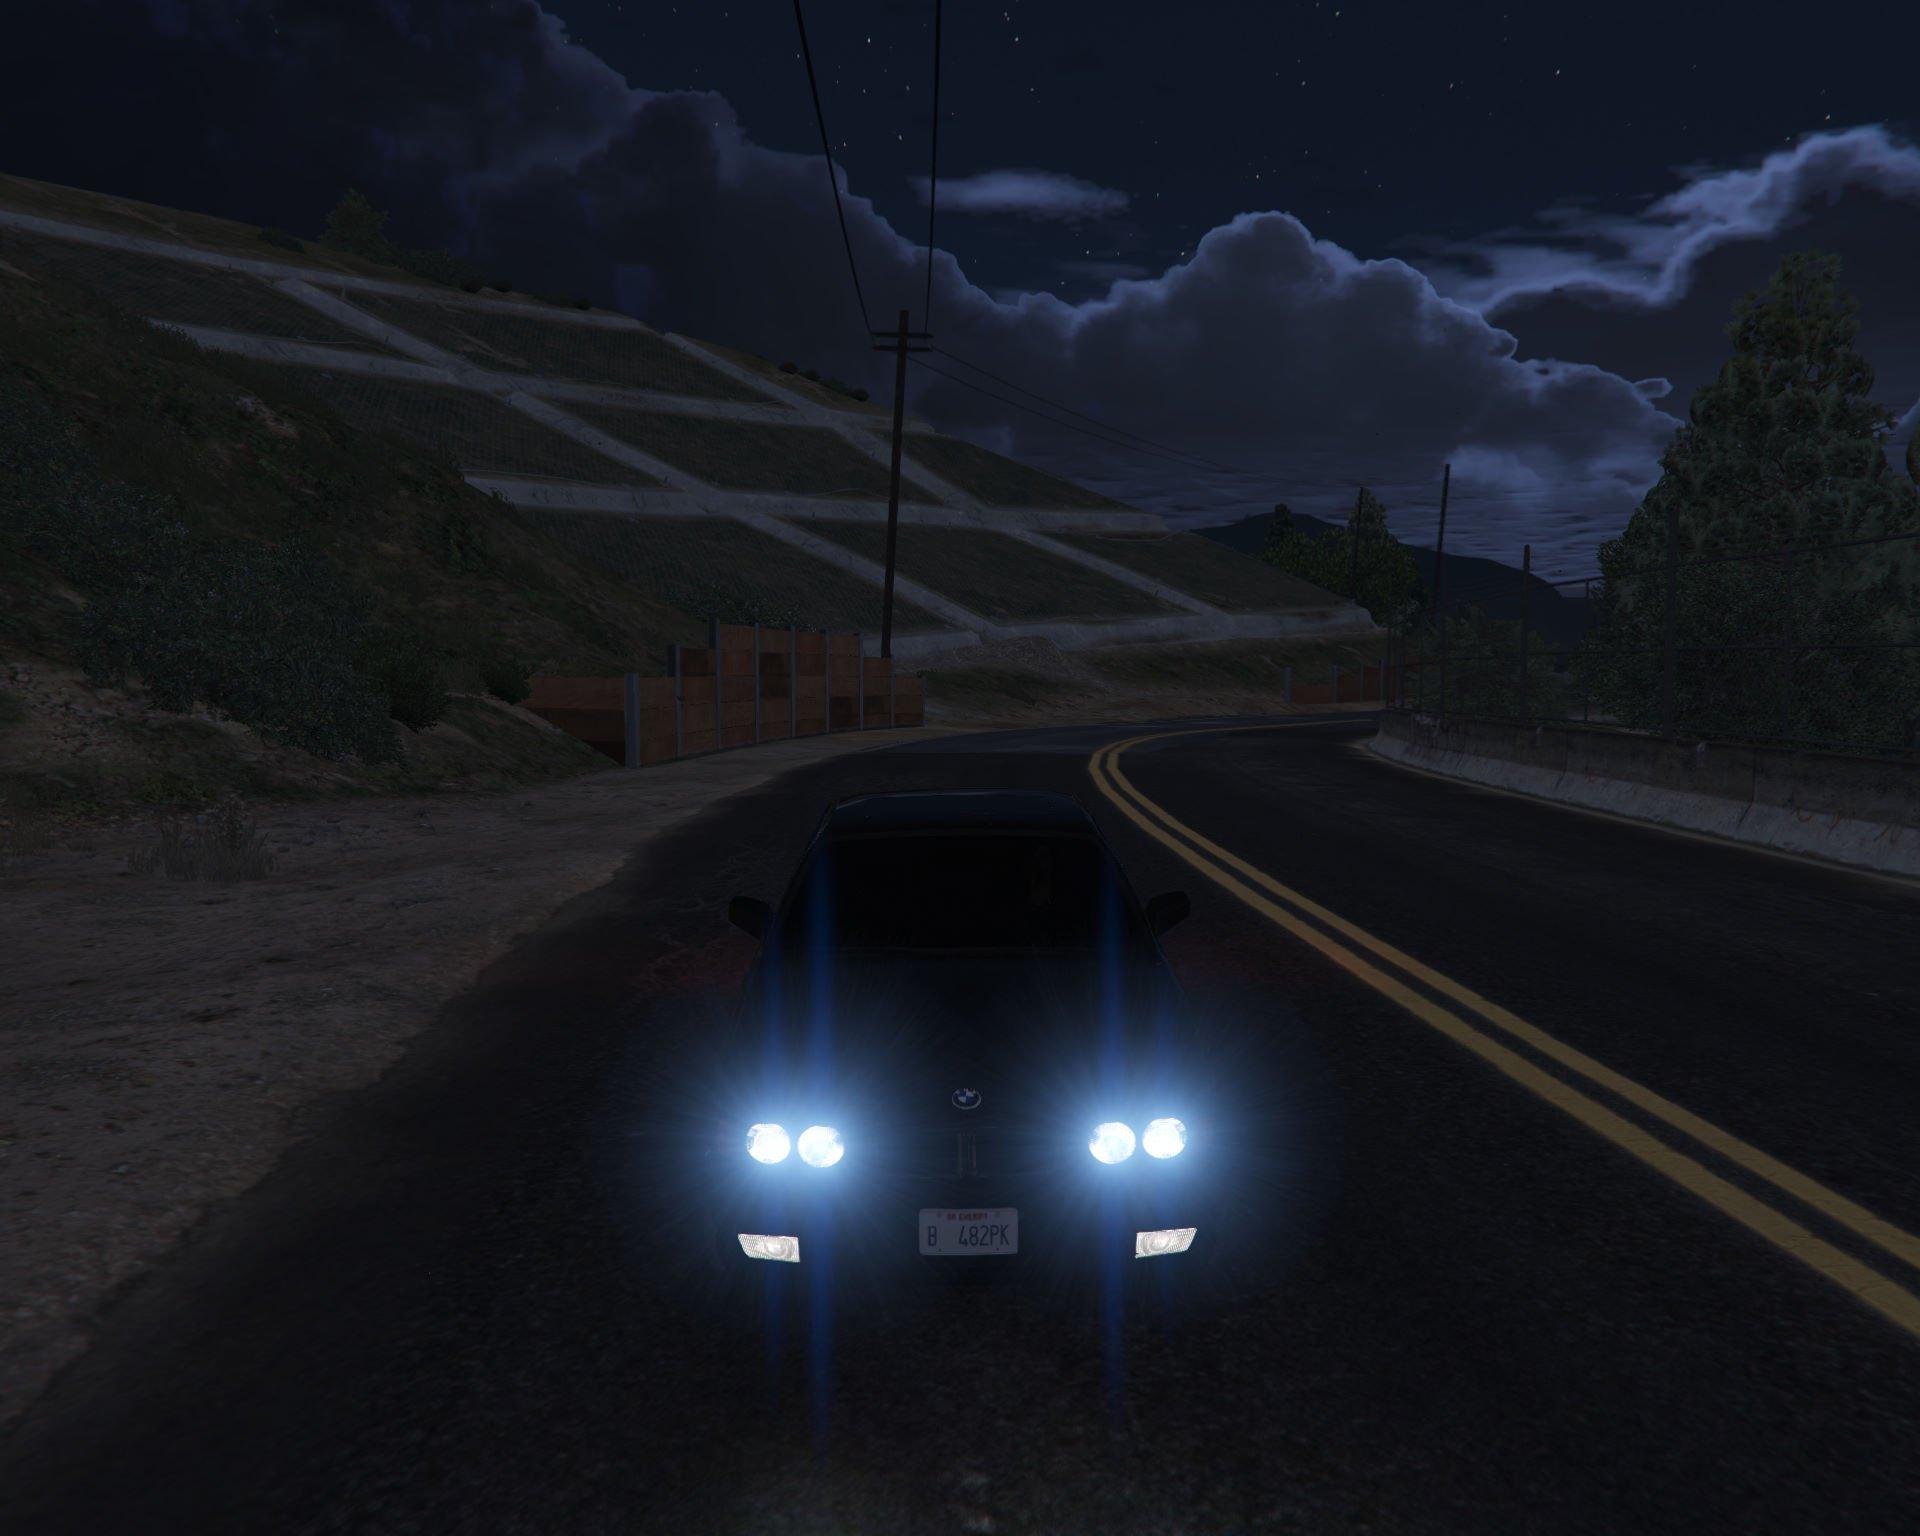 f633ce-bmw2.jpg - Grand Theft Auto 5